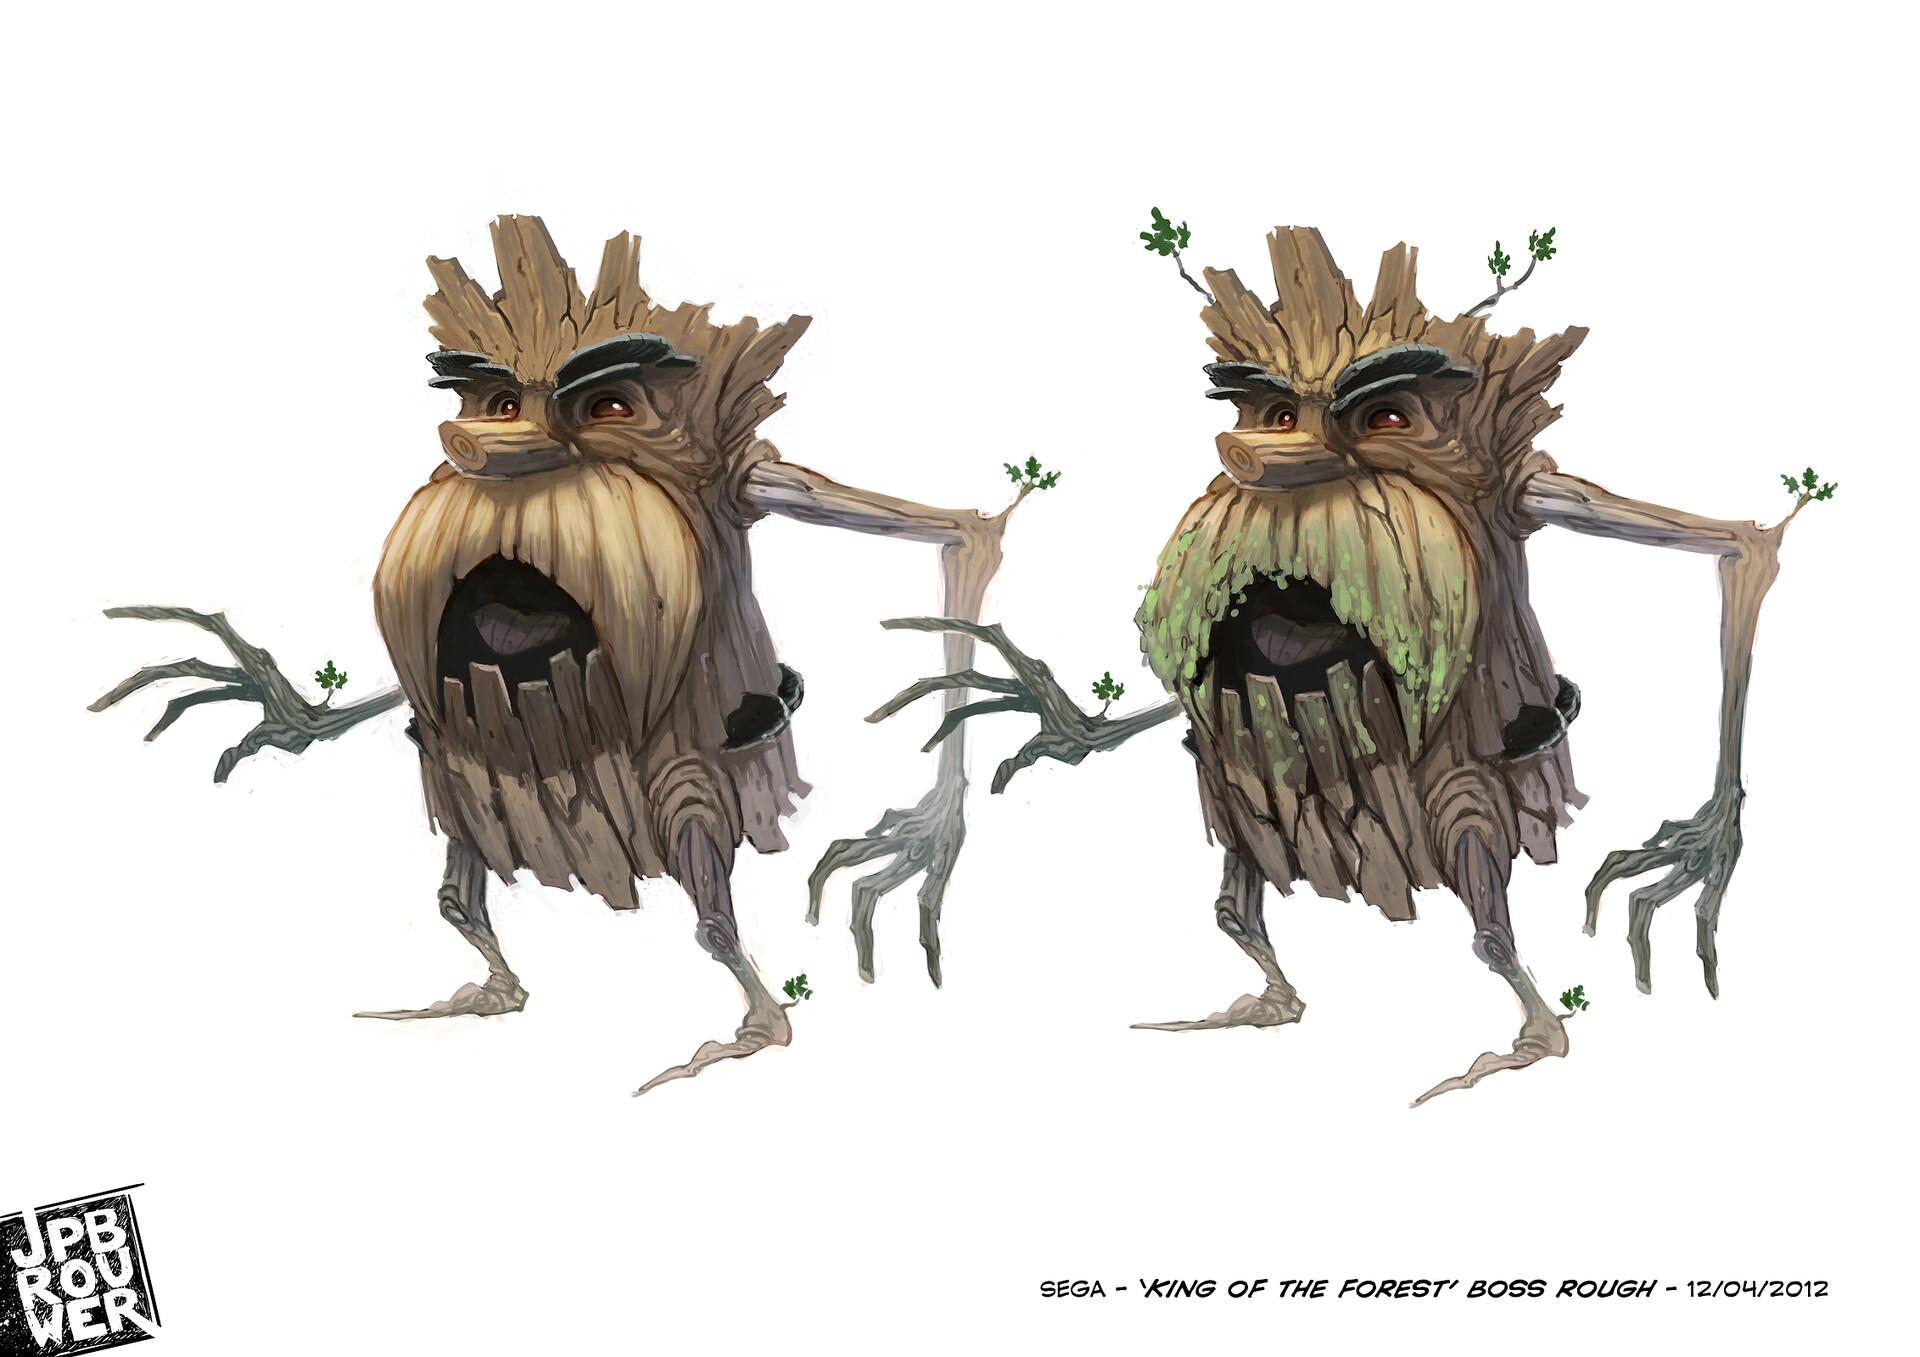 James brouwer sega kingoftheforest 120412b